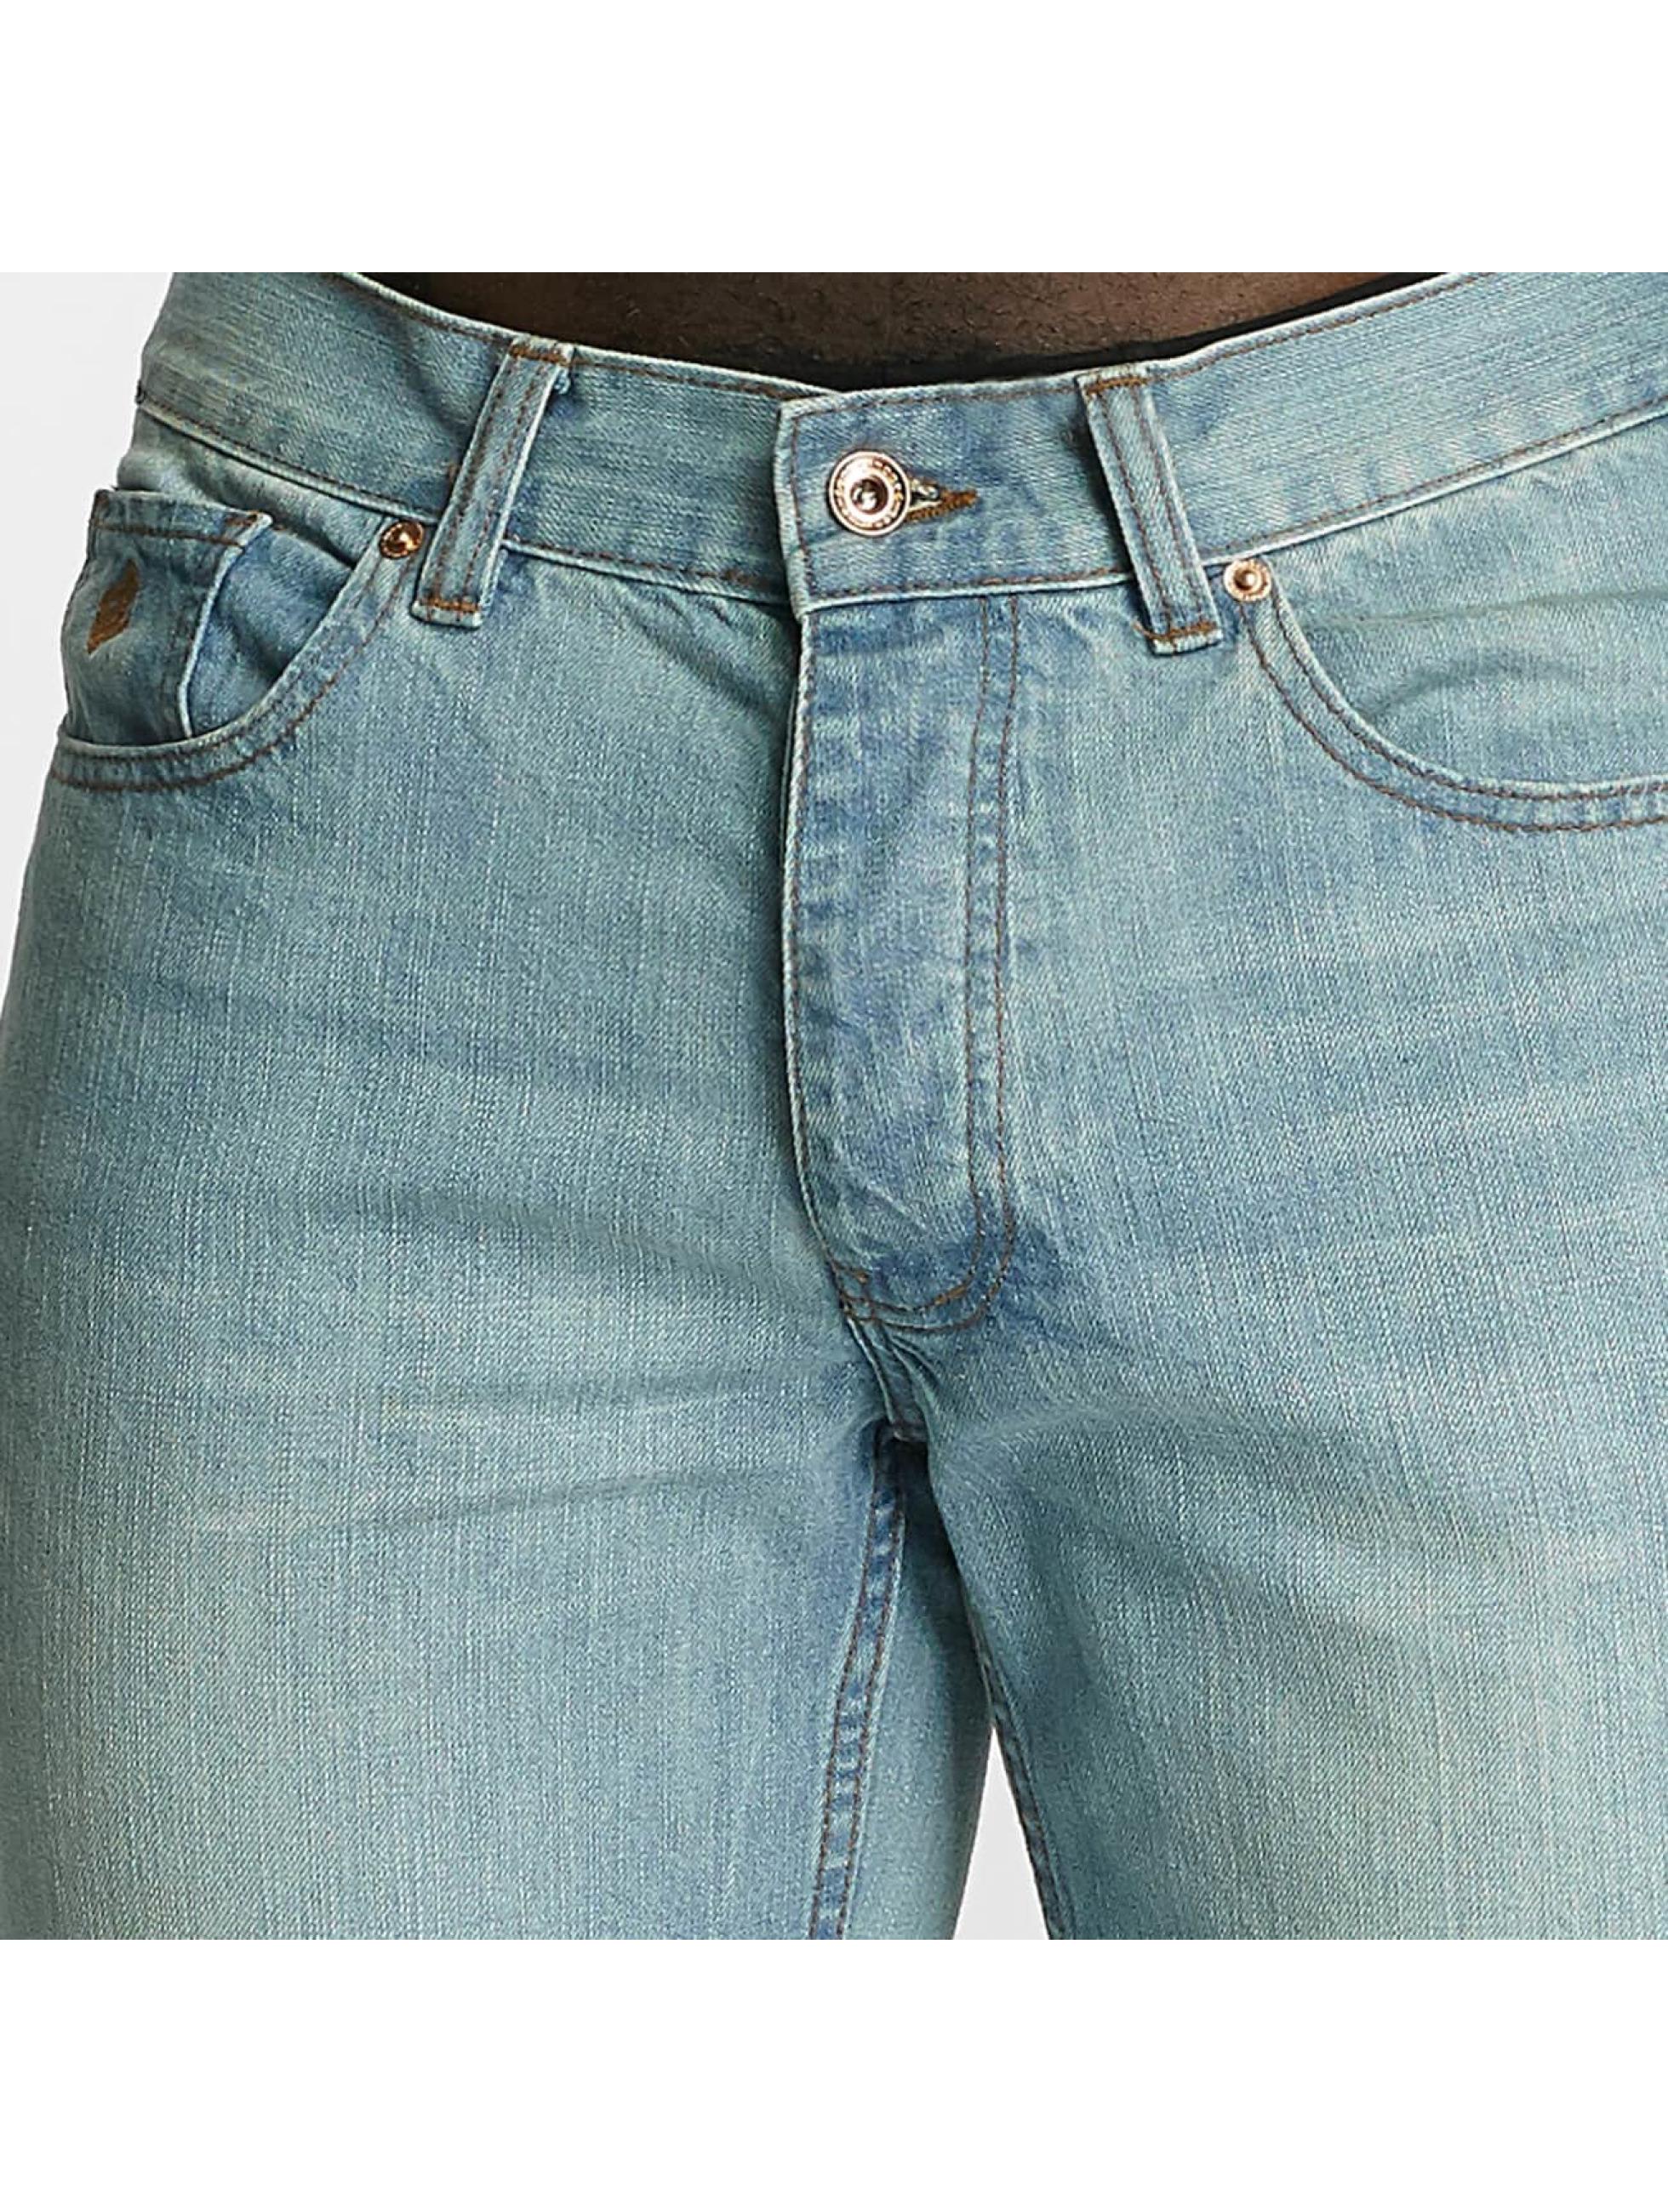 Rocawear-Uomini-Pantaloni-Shorts-Baggy